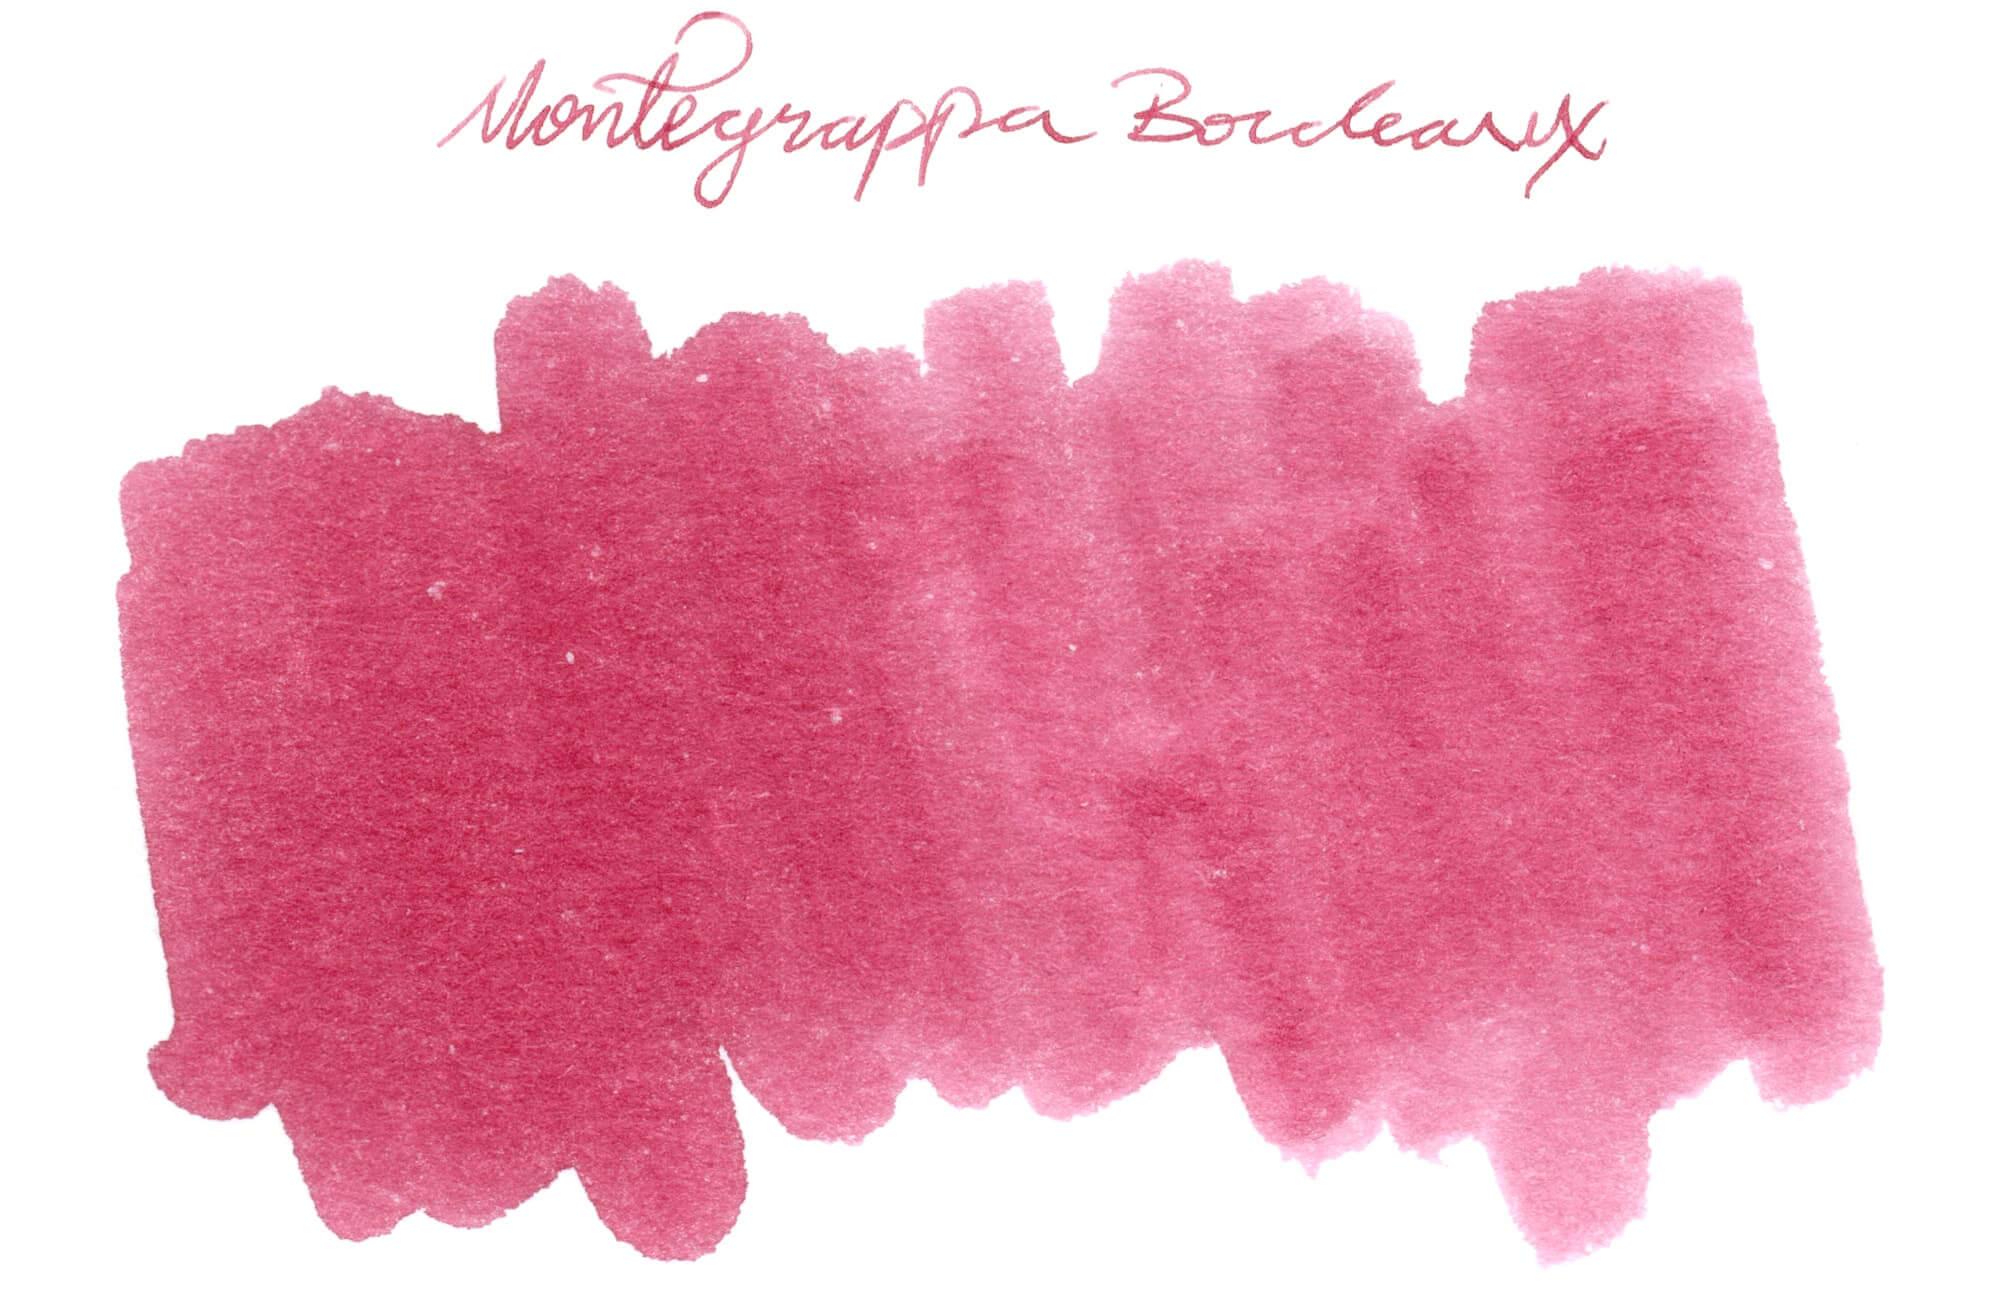 Montegrappa Bordeaux